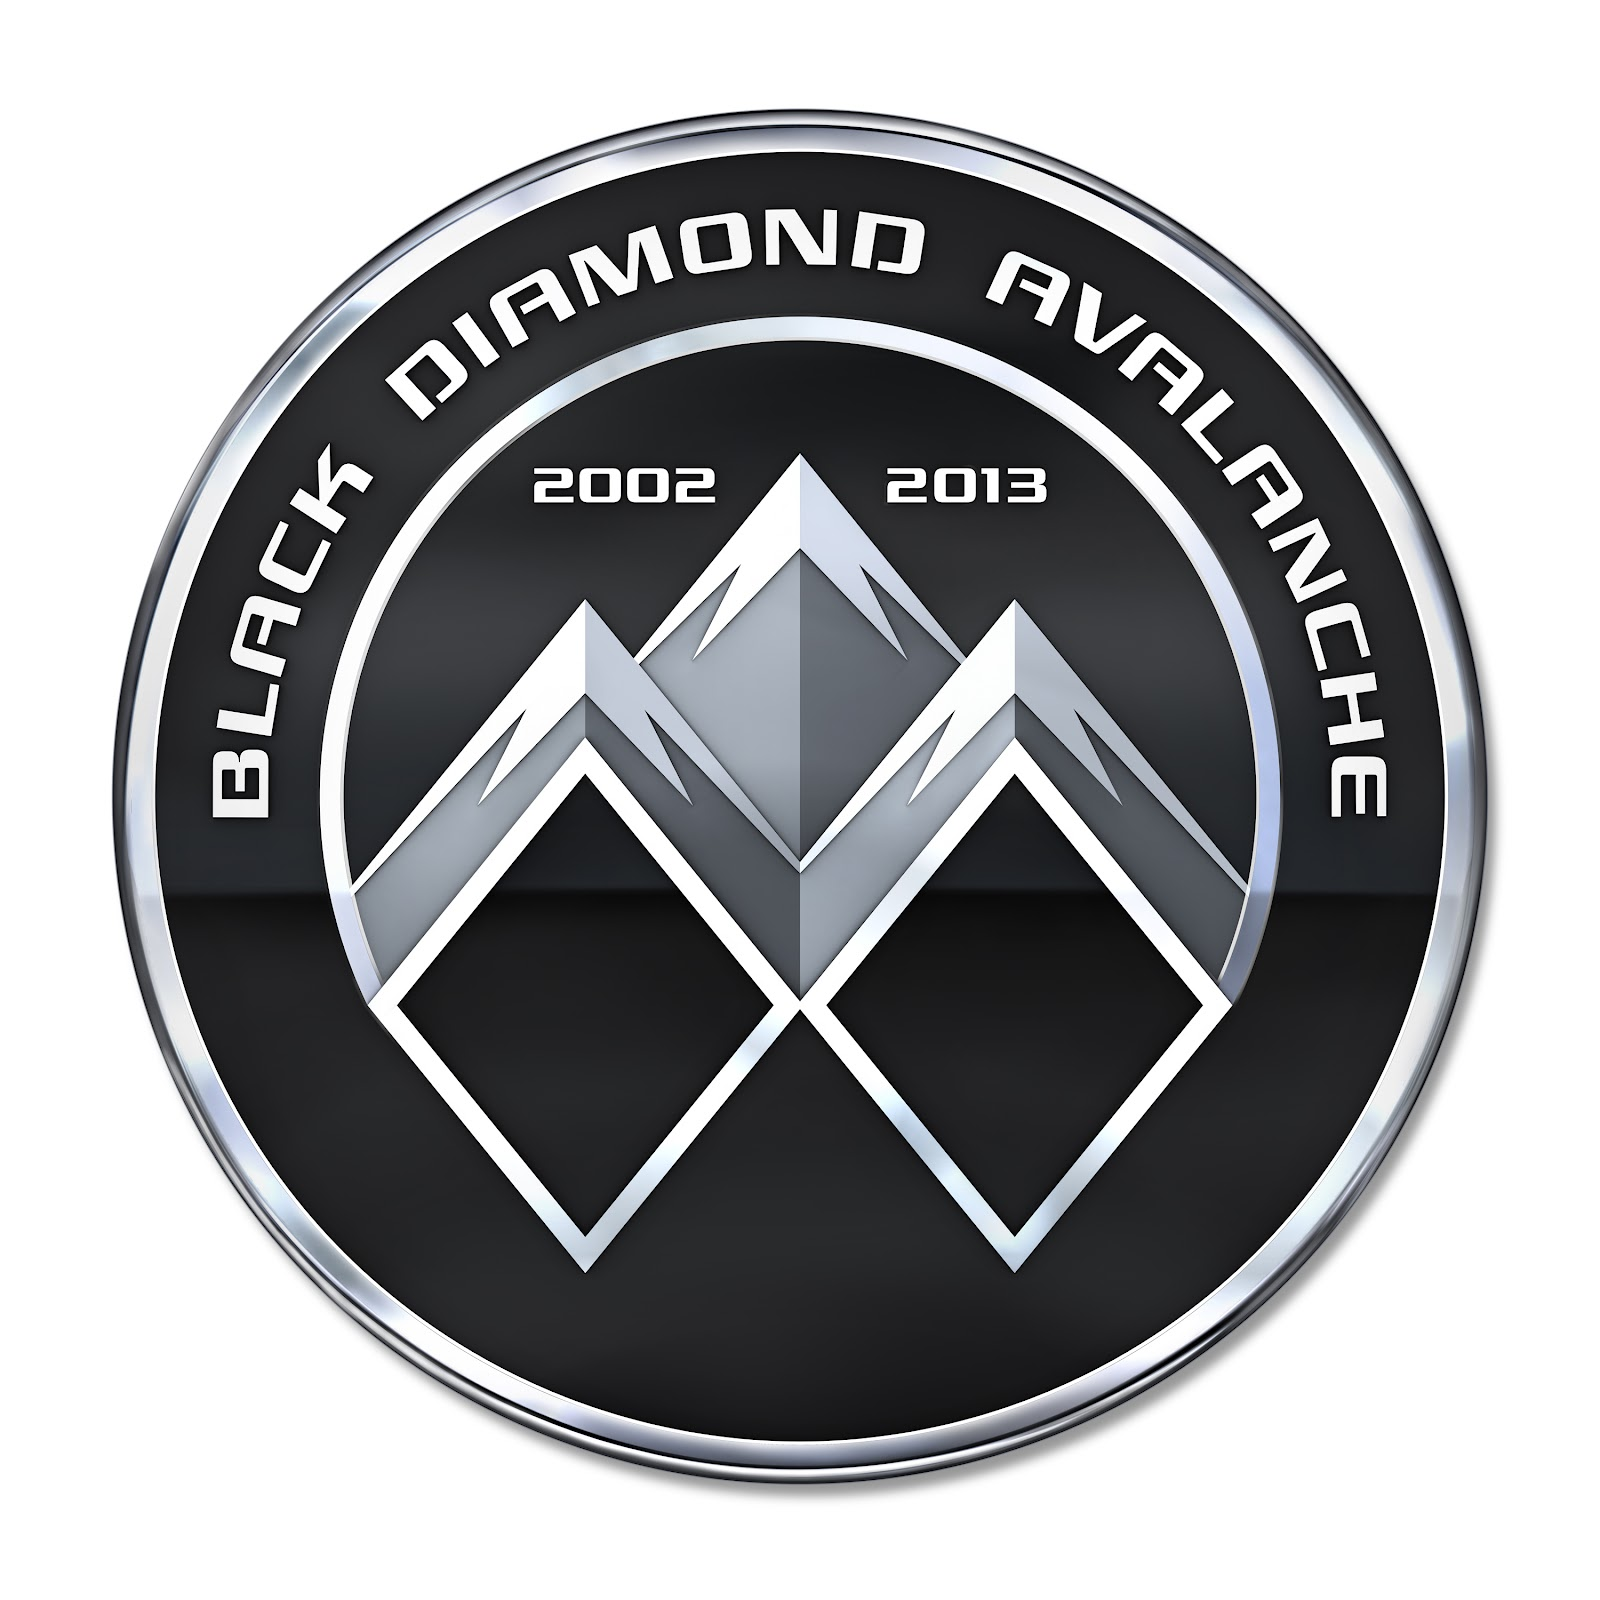 2013 Chevrolet Avalanche Black Diamond, Dernier Acte